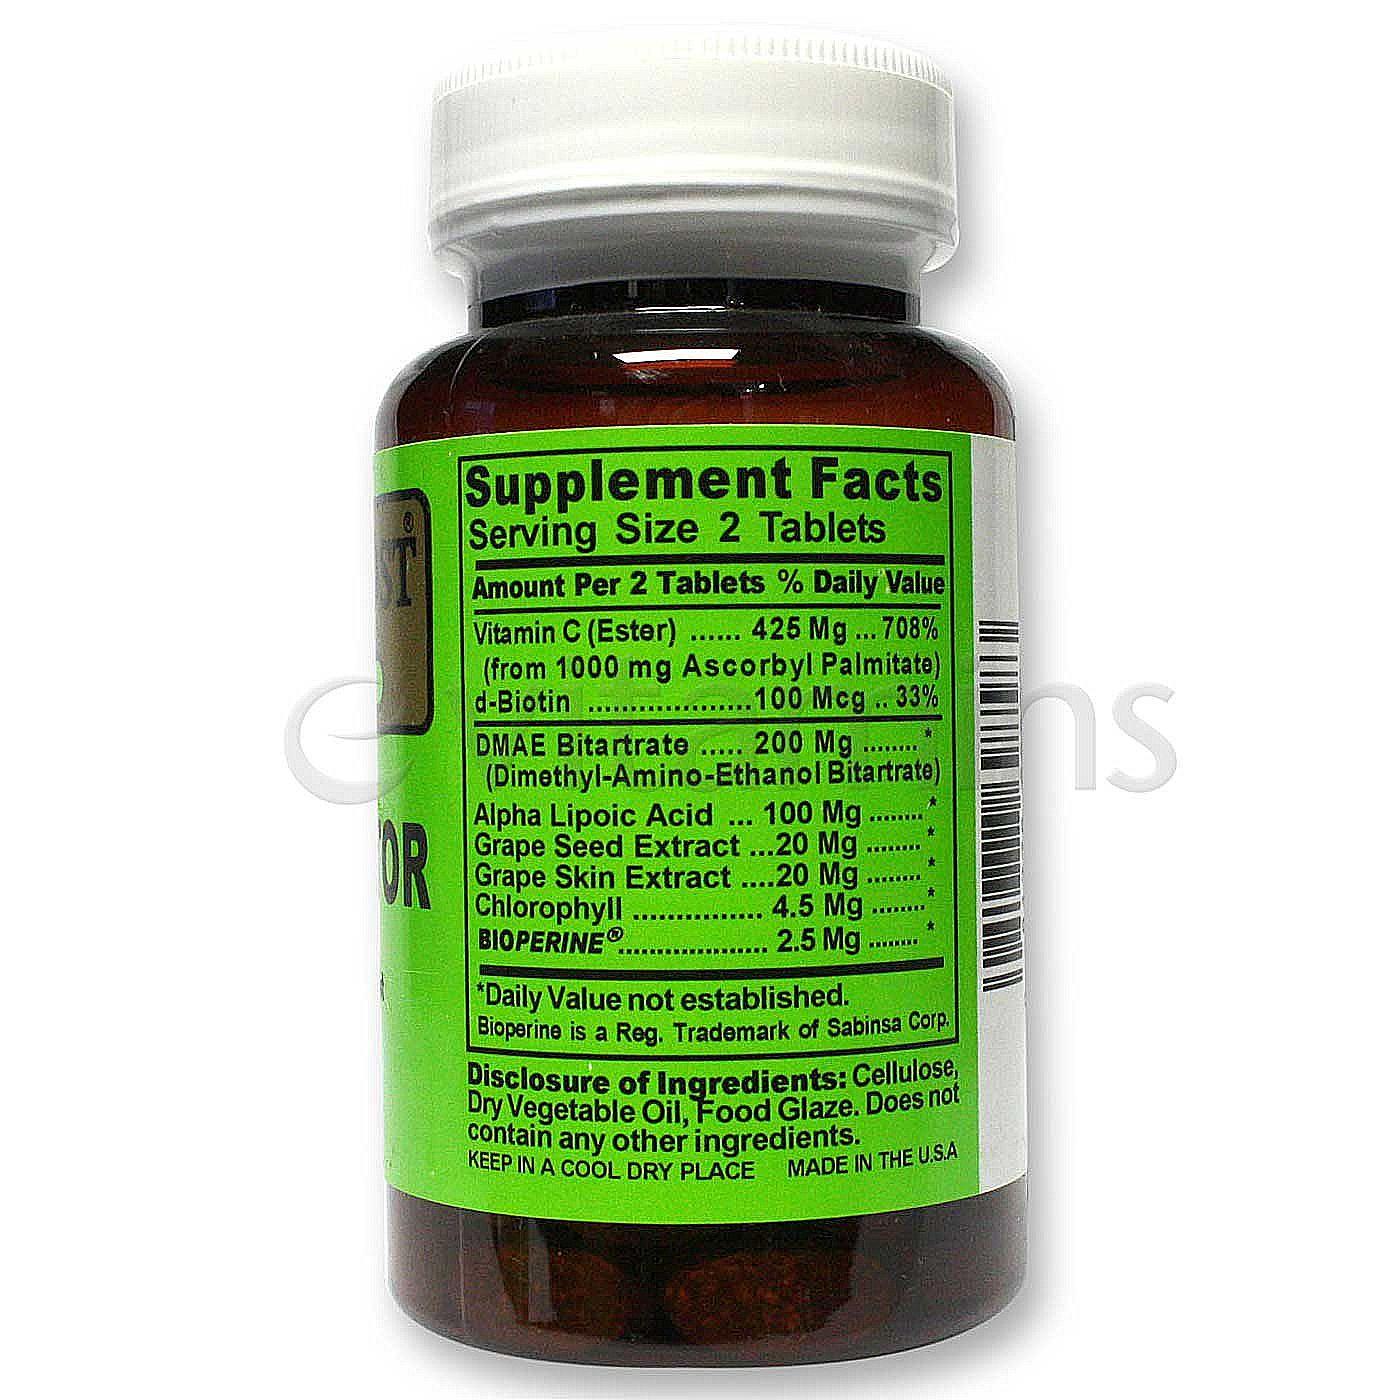 valtrex 500 mg price